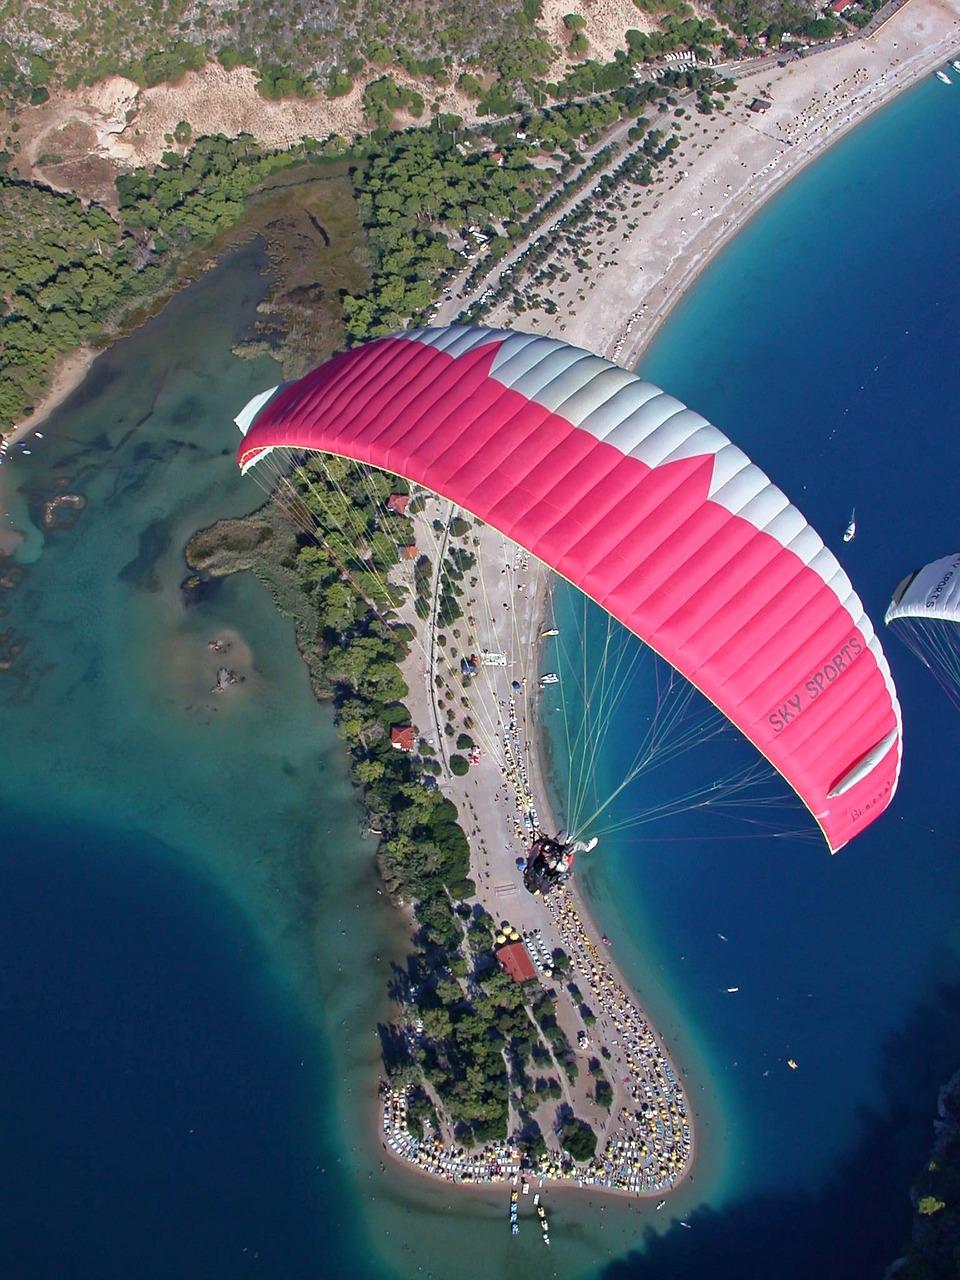 paragliding-parachute-sky-1219997.jpg